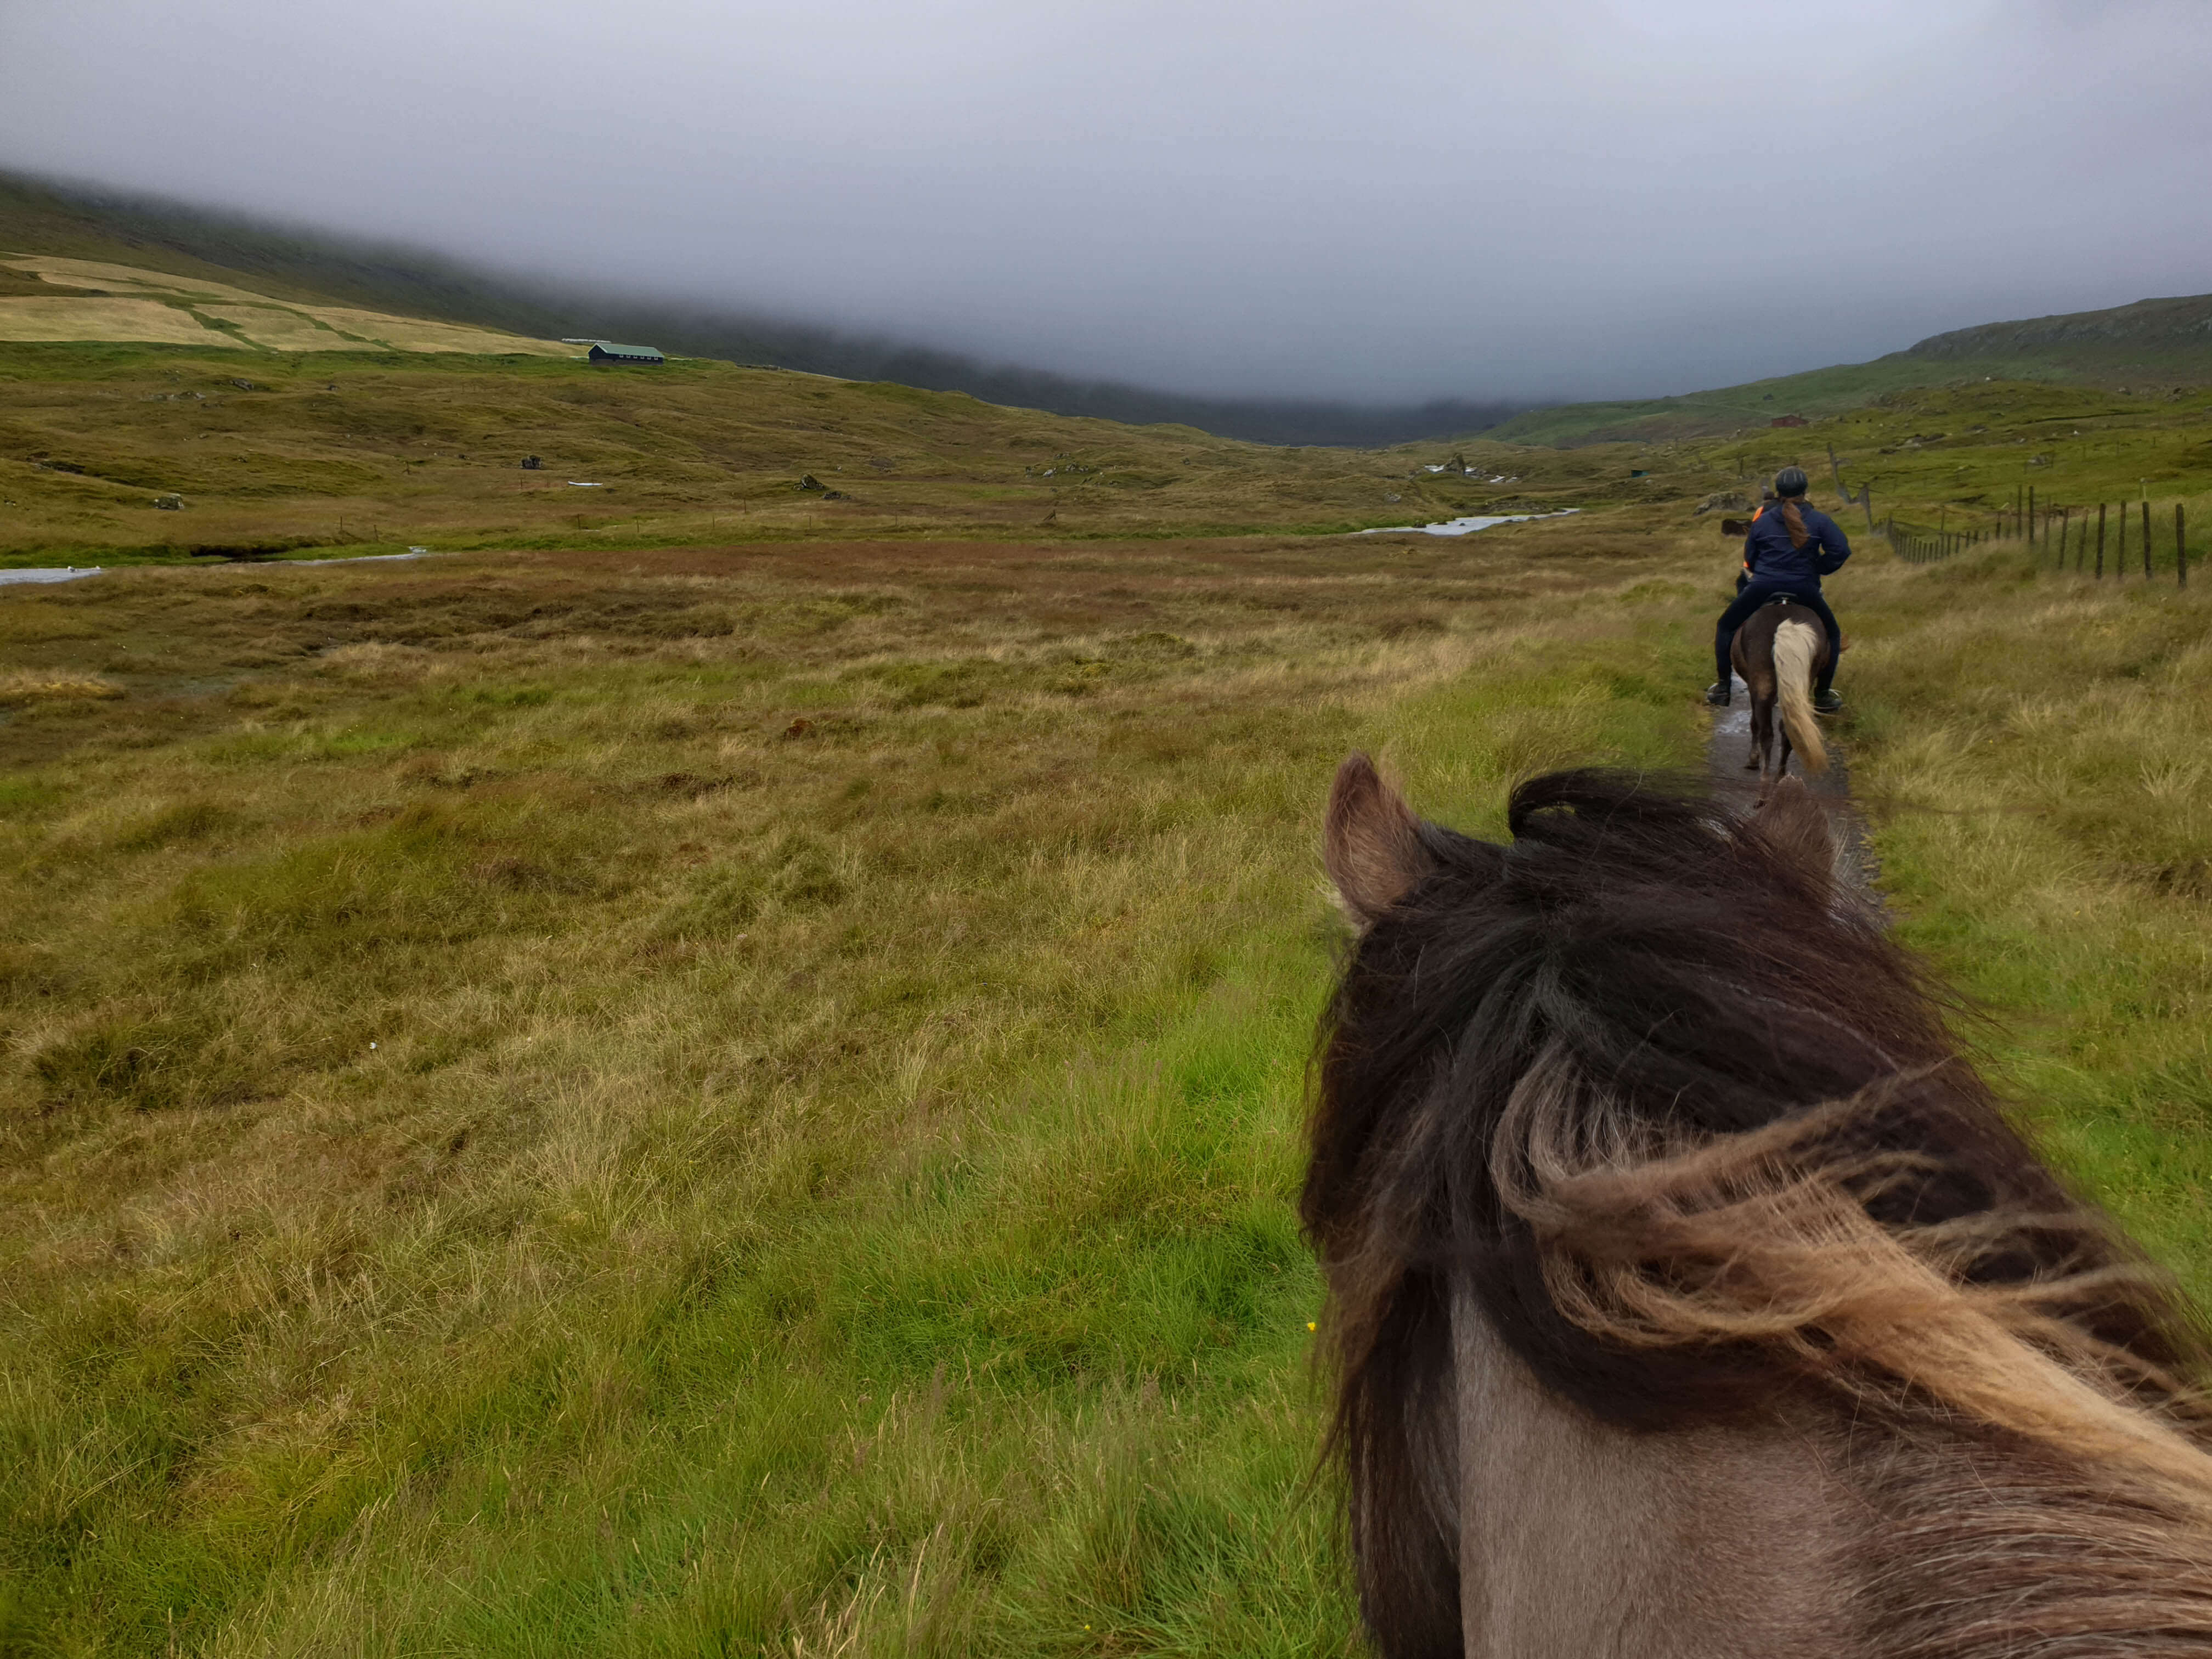 Paardrijdenop de Faeröer Eilanden